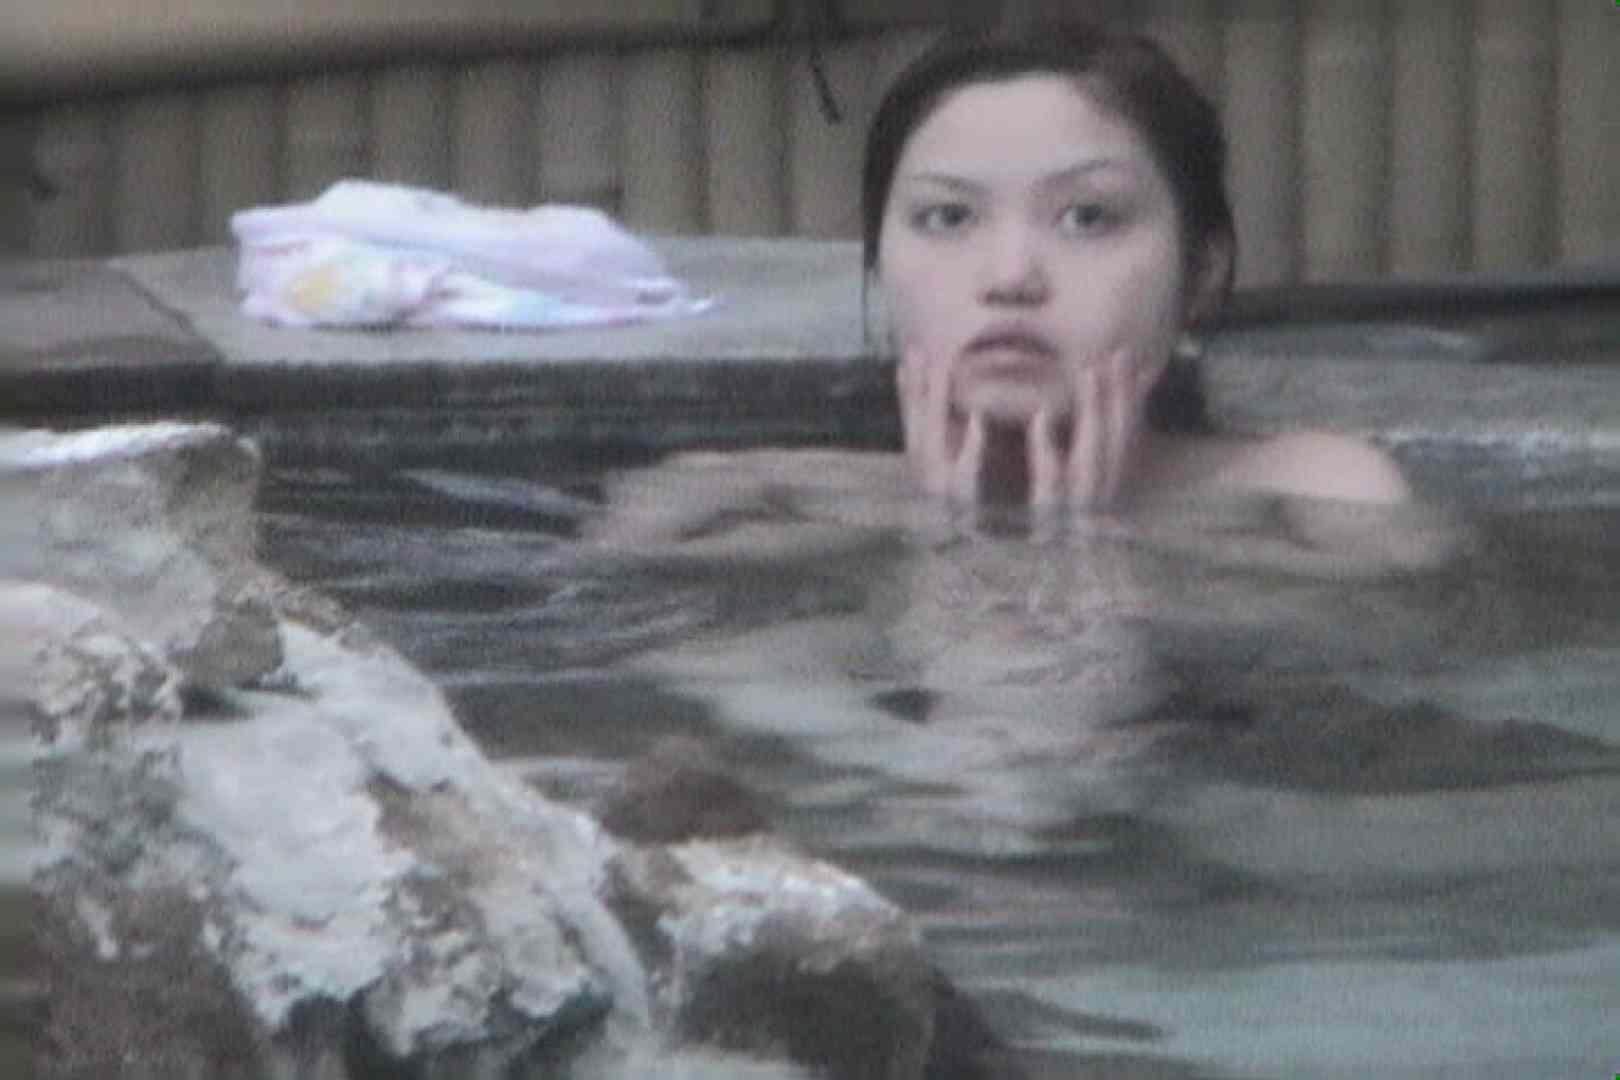 Aquaな露天風呂Vol.602 OLセックス 盗み撮りオマンコ動画キャプチャ 70画像 29